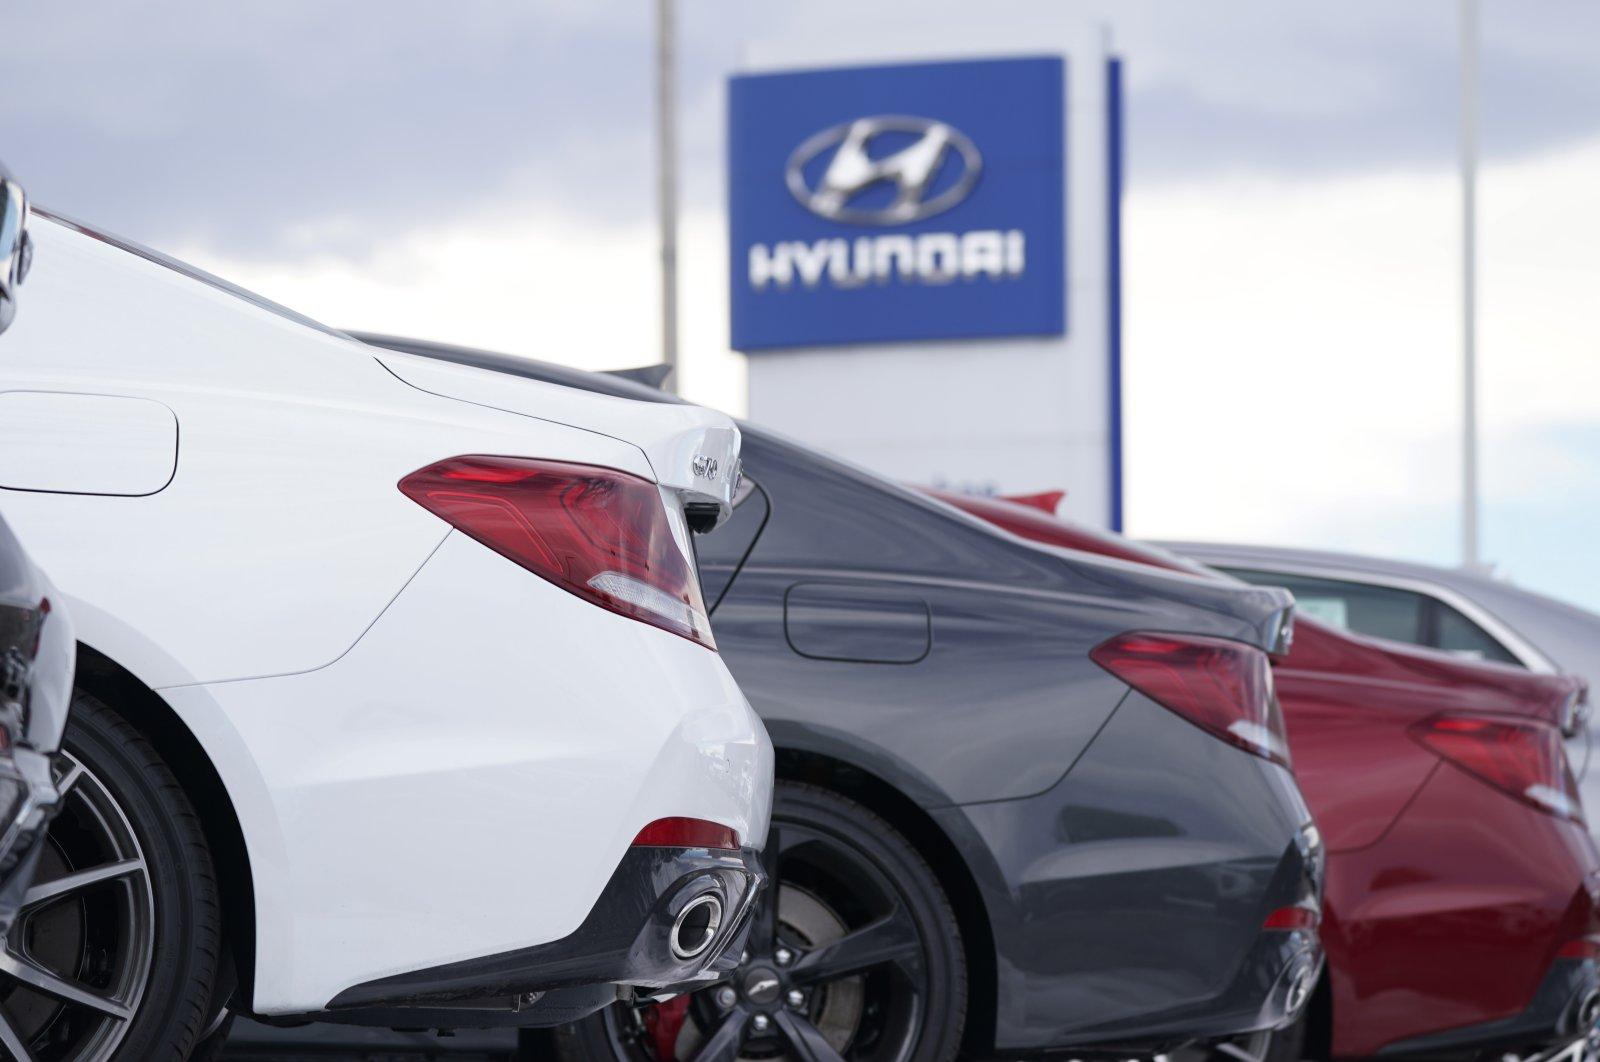 A long row of unsold 2021 Genesis sedans sit at a Hyundai dealership in Centennial, Colorado, U.S., Dec. 20, 2020. (AP Photo)